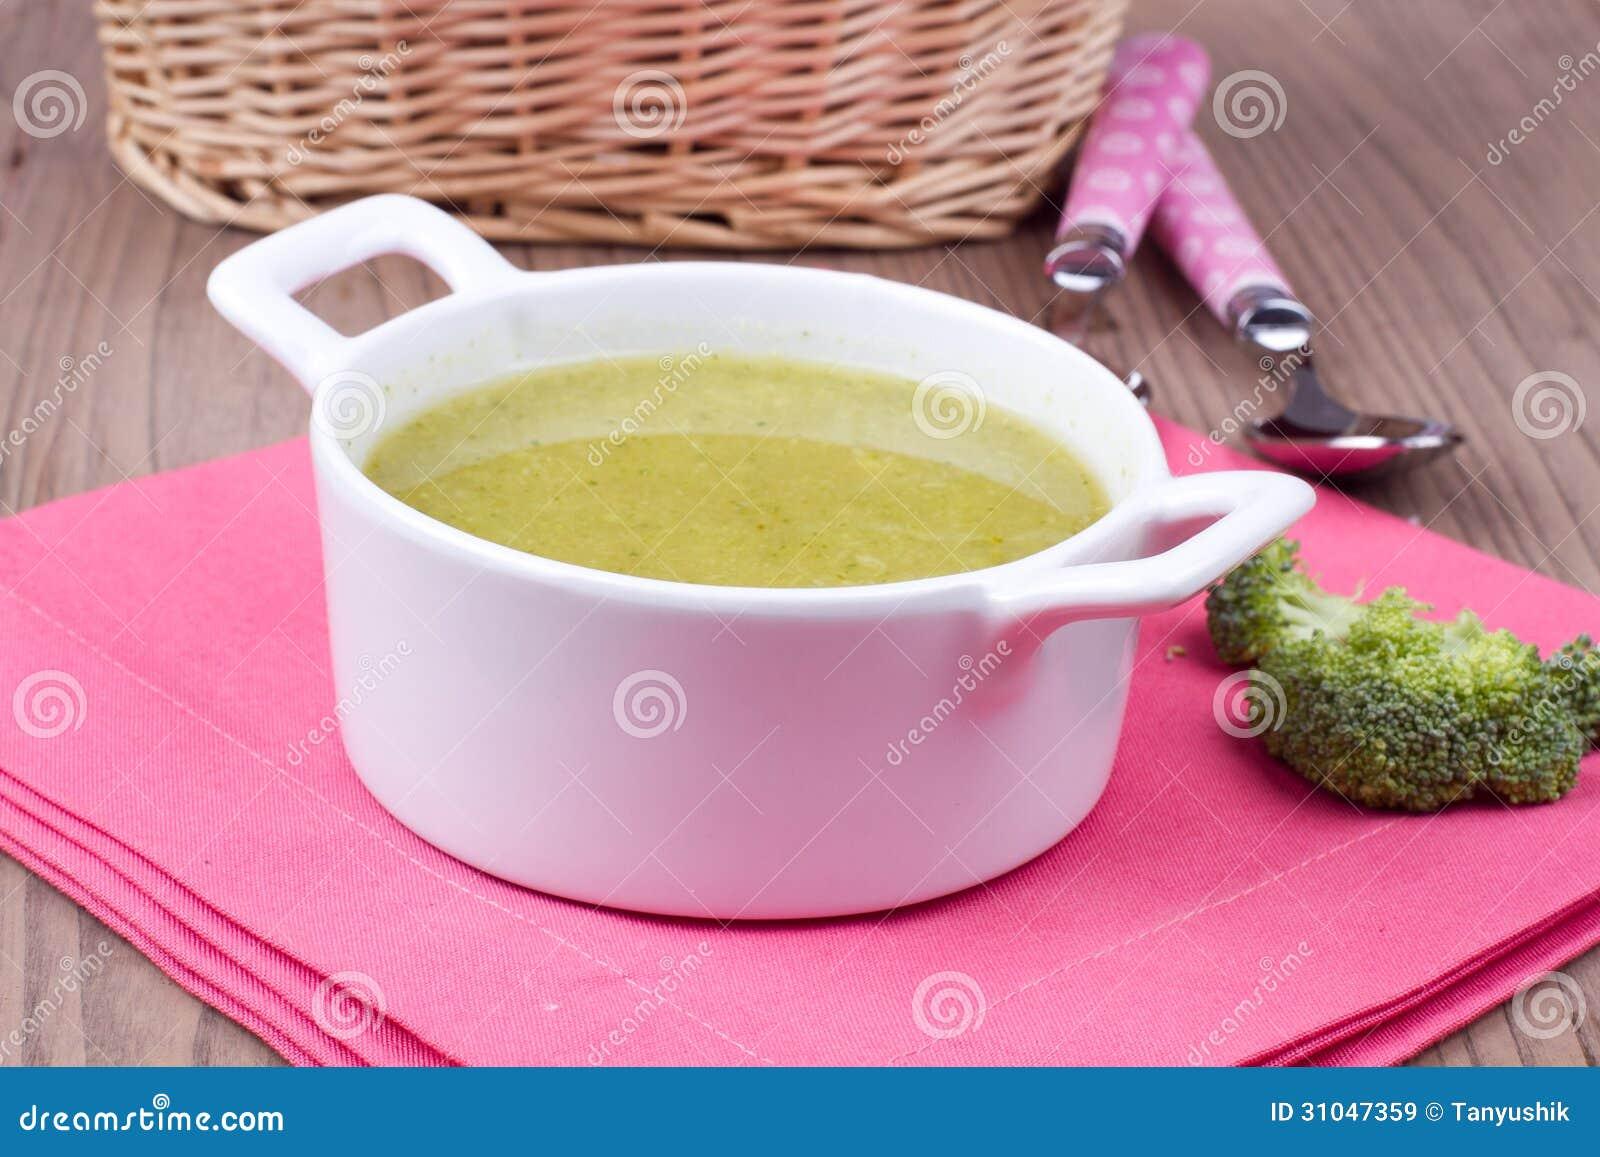 Soep met brocolli